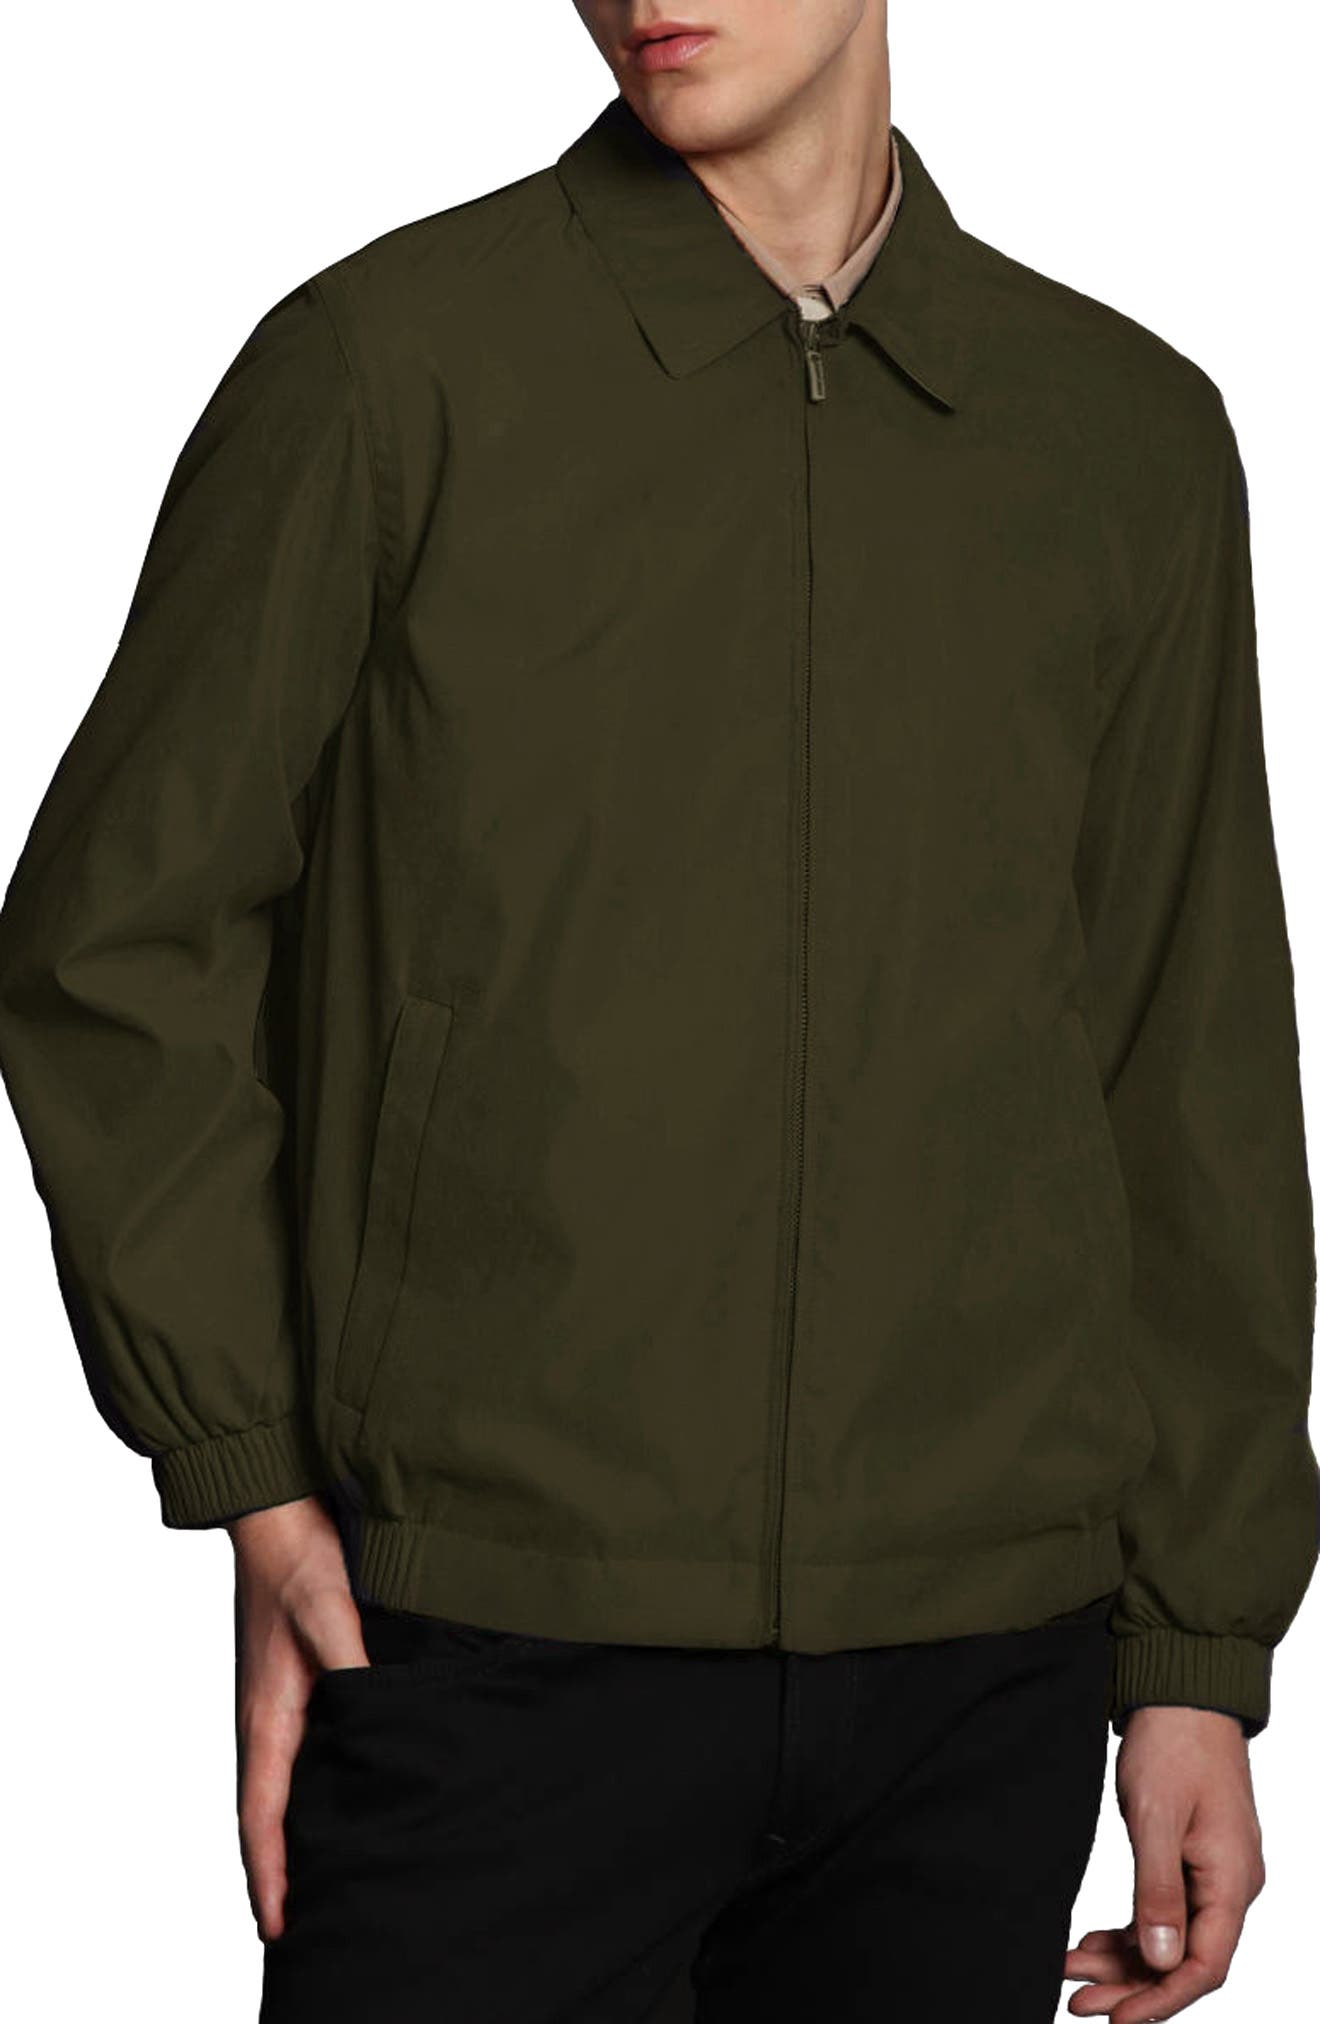 'Microseta' Lightweight Golf Jacket,                             Main thumbnail 1, color,                             Oregano